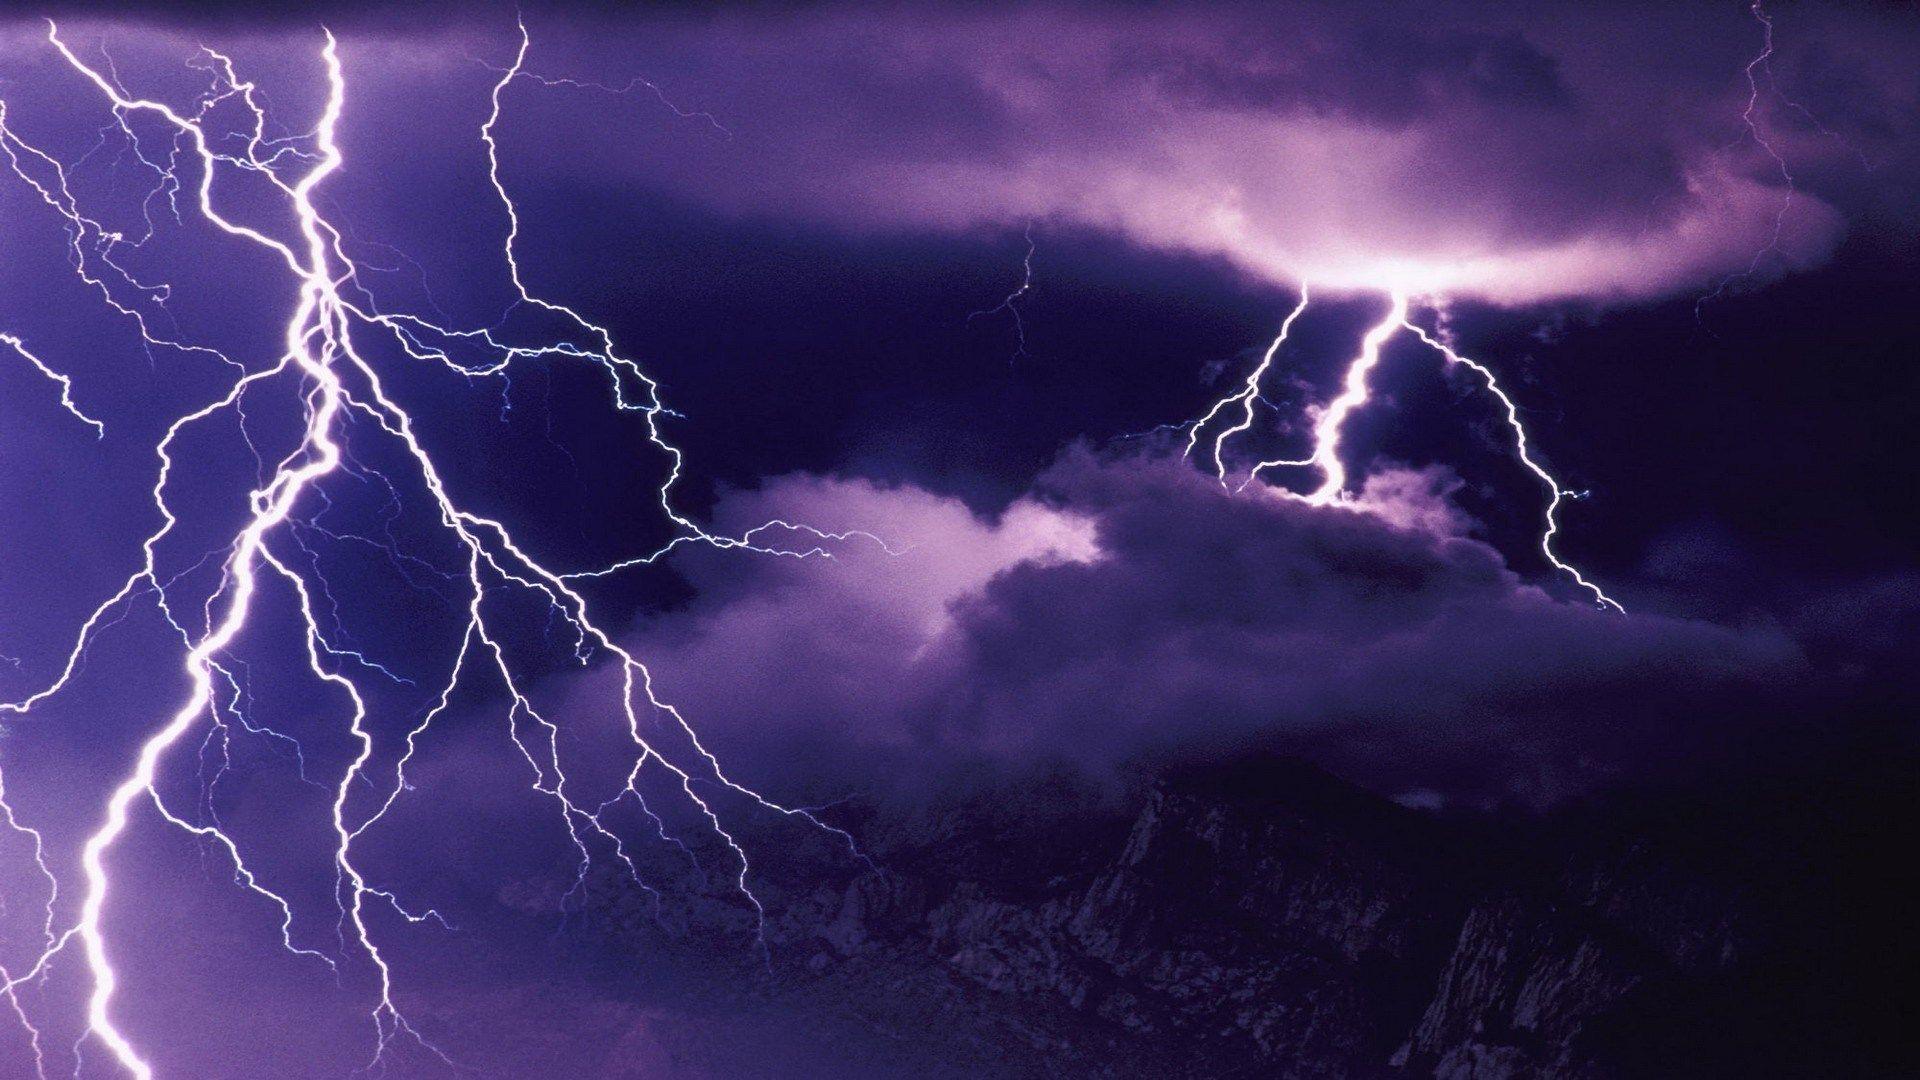 4k lightning wallpapers